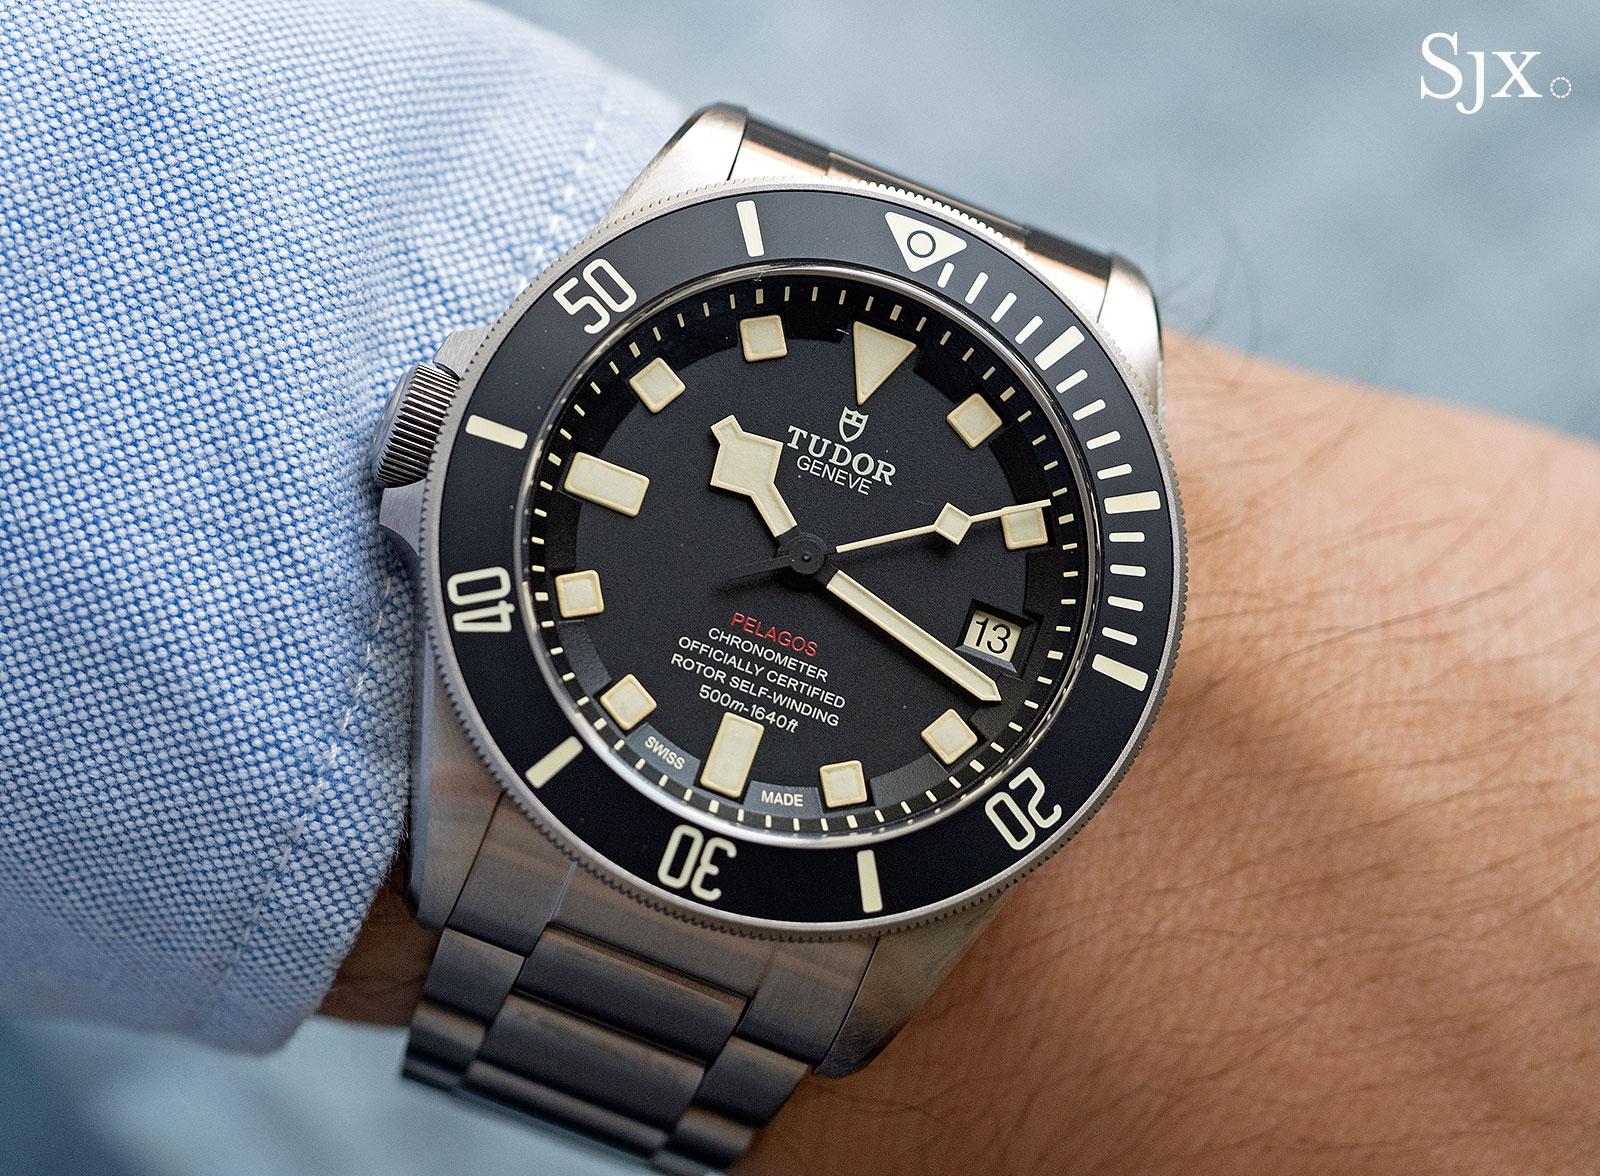 Tudor-Pelagos-LHD-review-4.